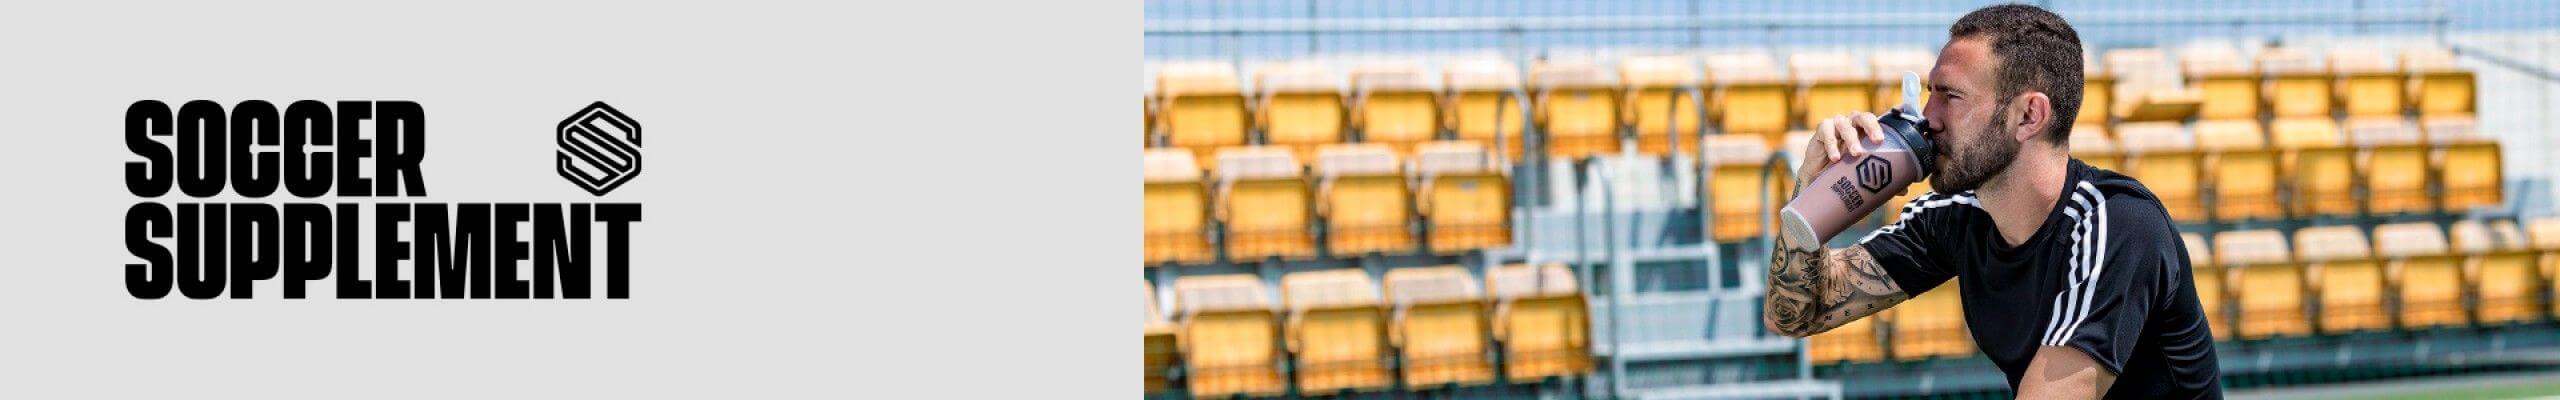 Miguel Layun a beber Soccer Supplement®